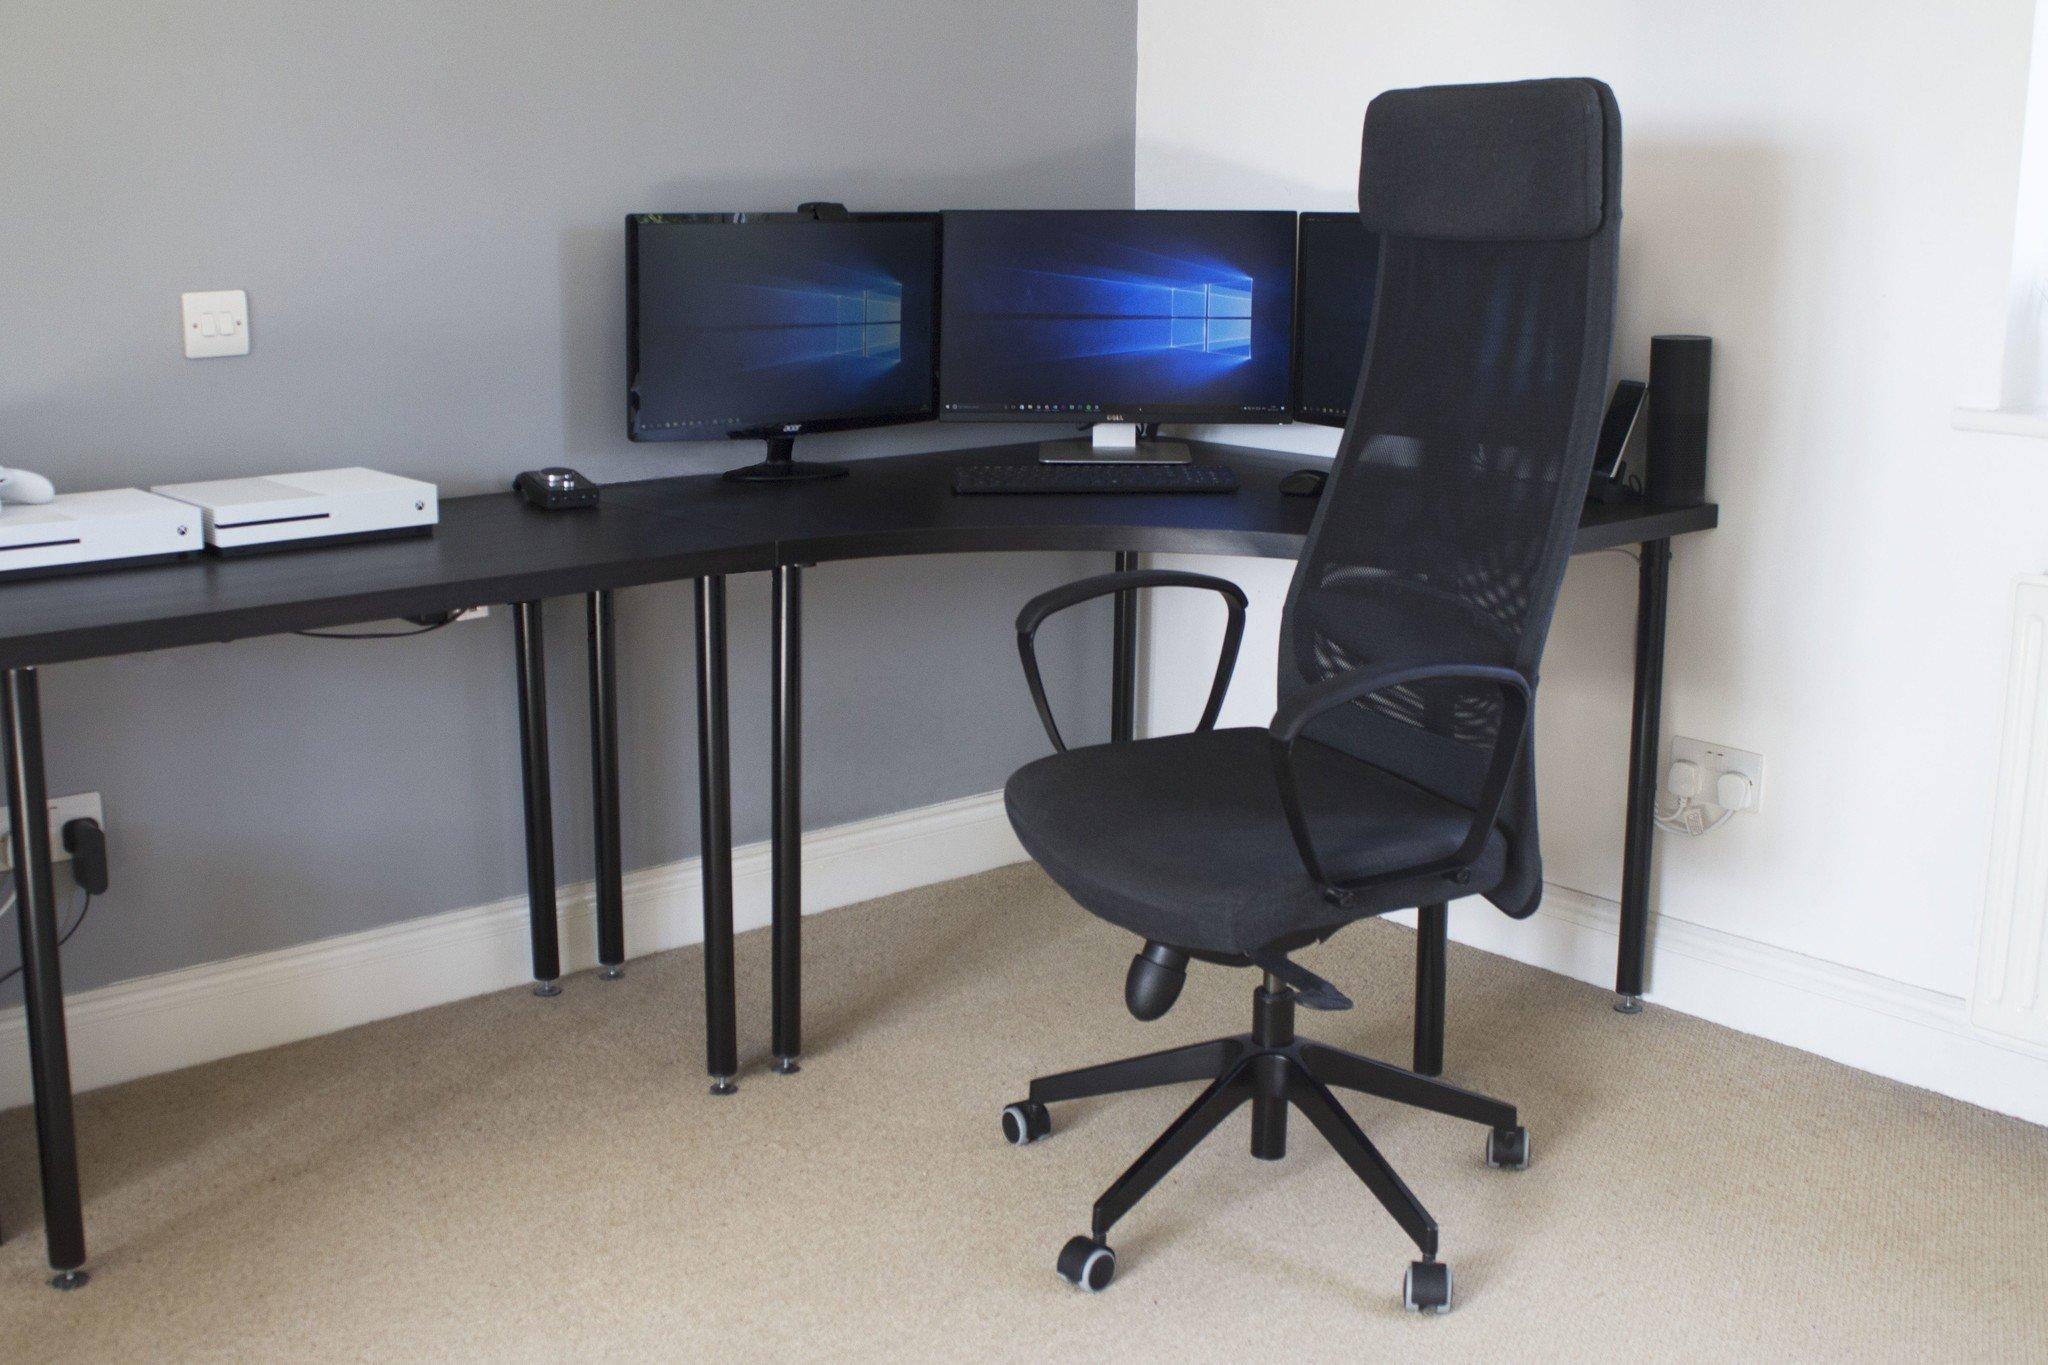 IKEA Markus Office Chair Review Highback comfort